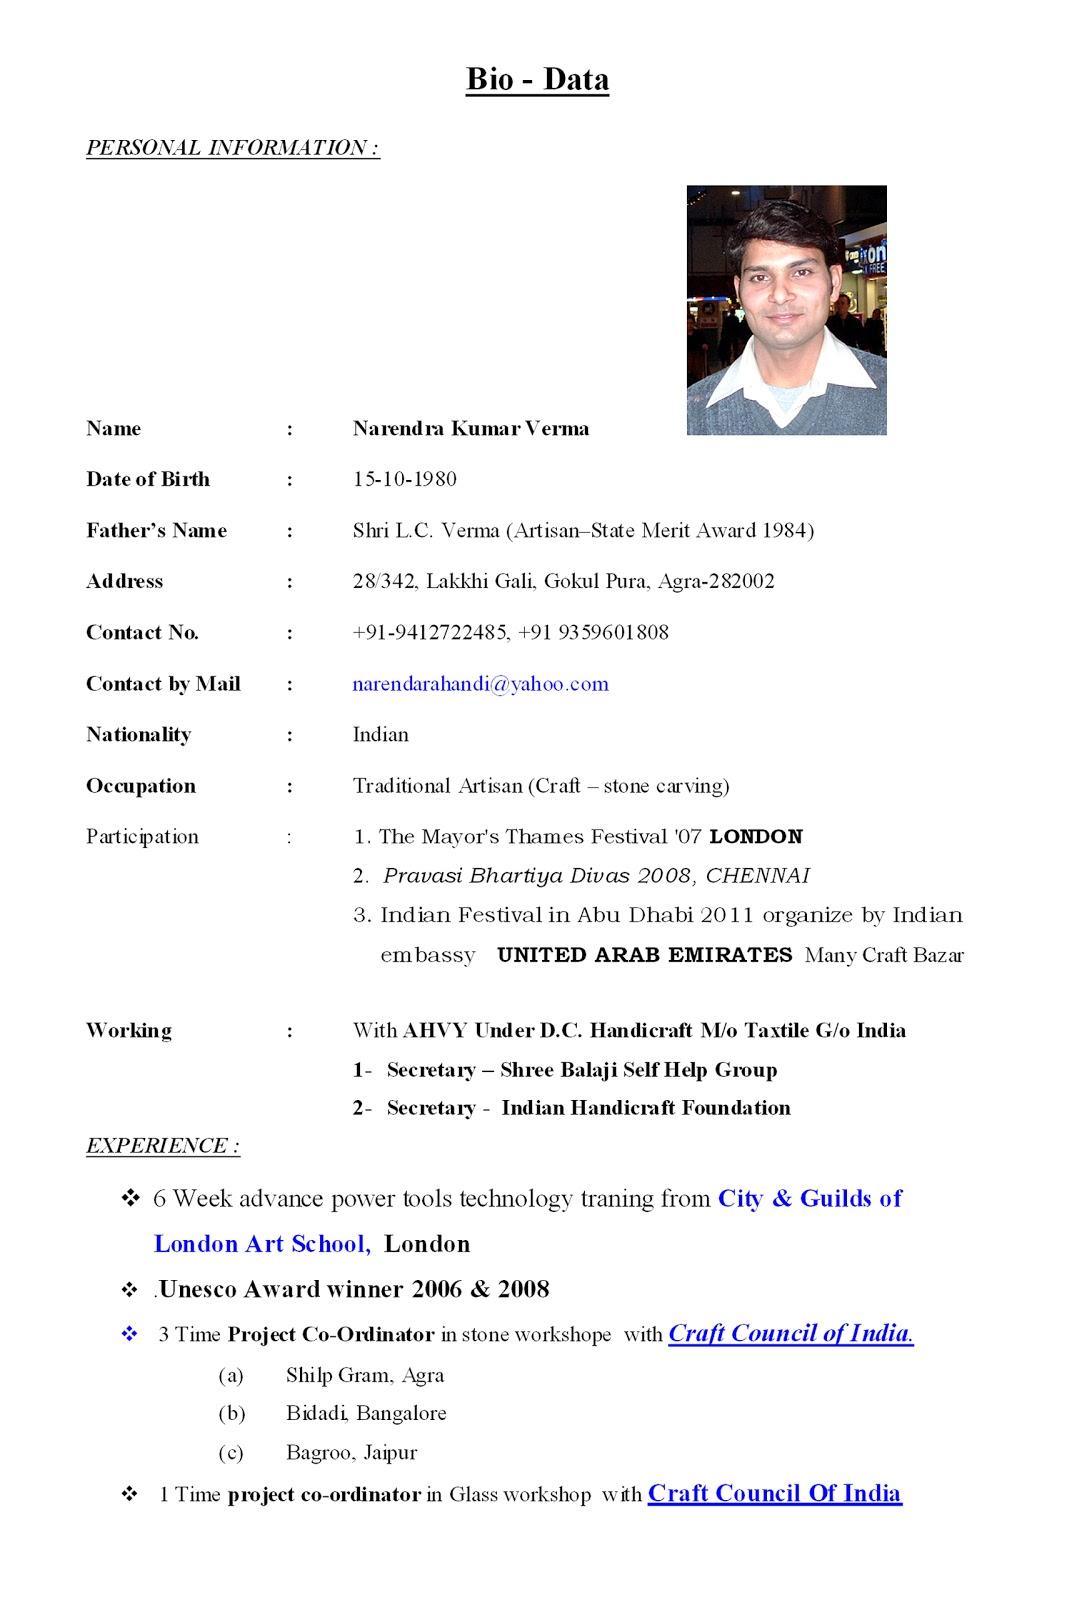 Resume Biodata Sample Form Applicants Facebookthesis Web Fc2 Com